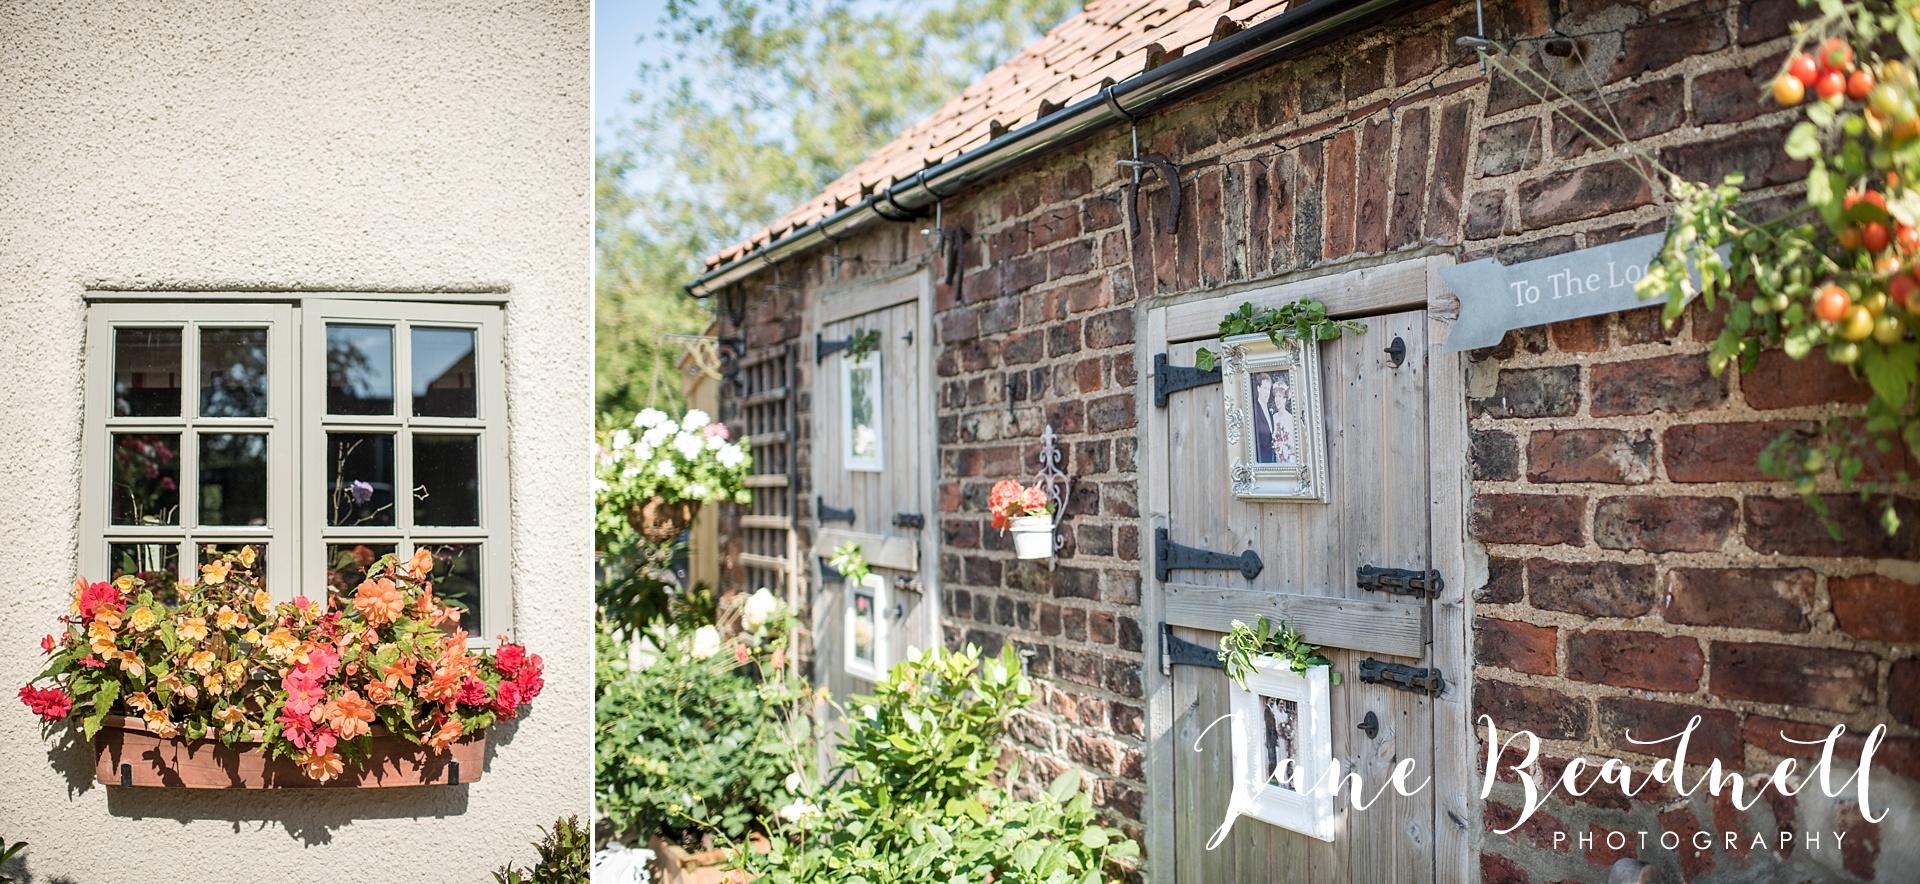 fine-art-wedding-photographer-jane-beadnell-yorkshire-wedding-photographer-garden-wedding_0006